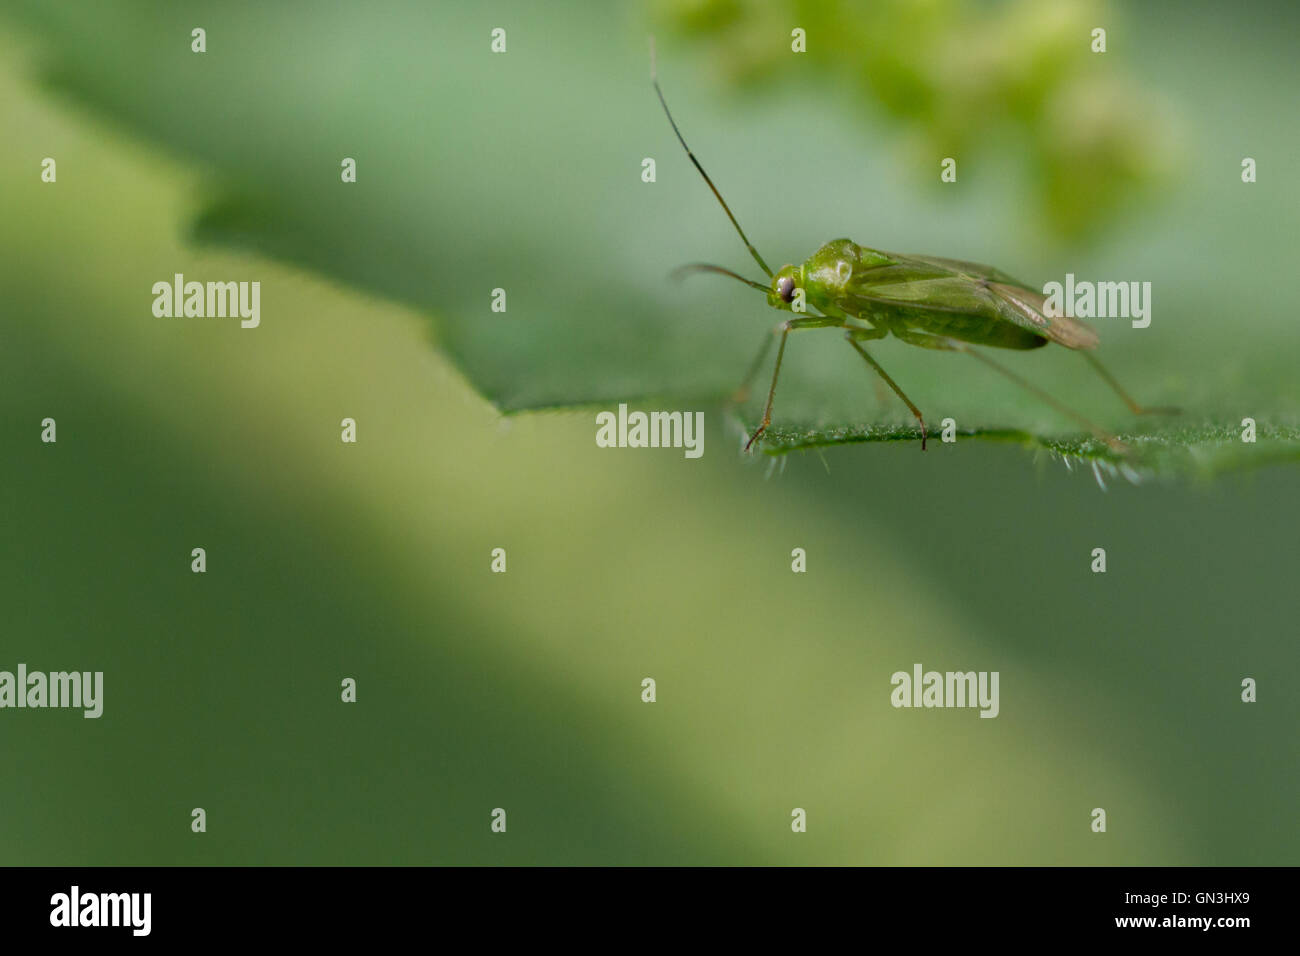 Lygocoris pabulinus, the common green capsid, Yorkshire, UK - Stock Image